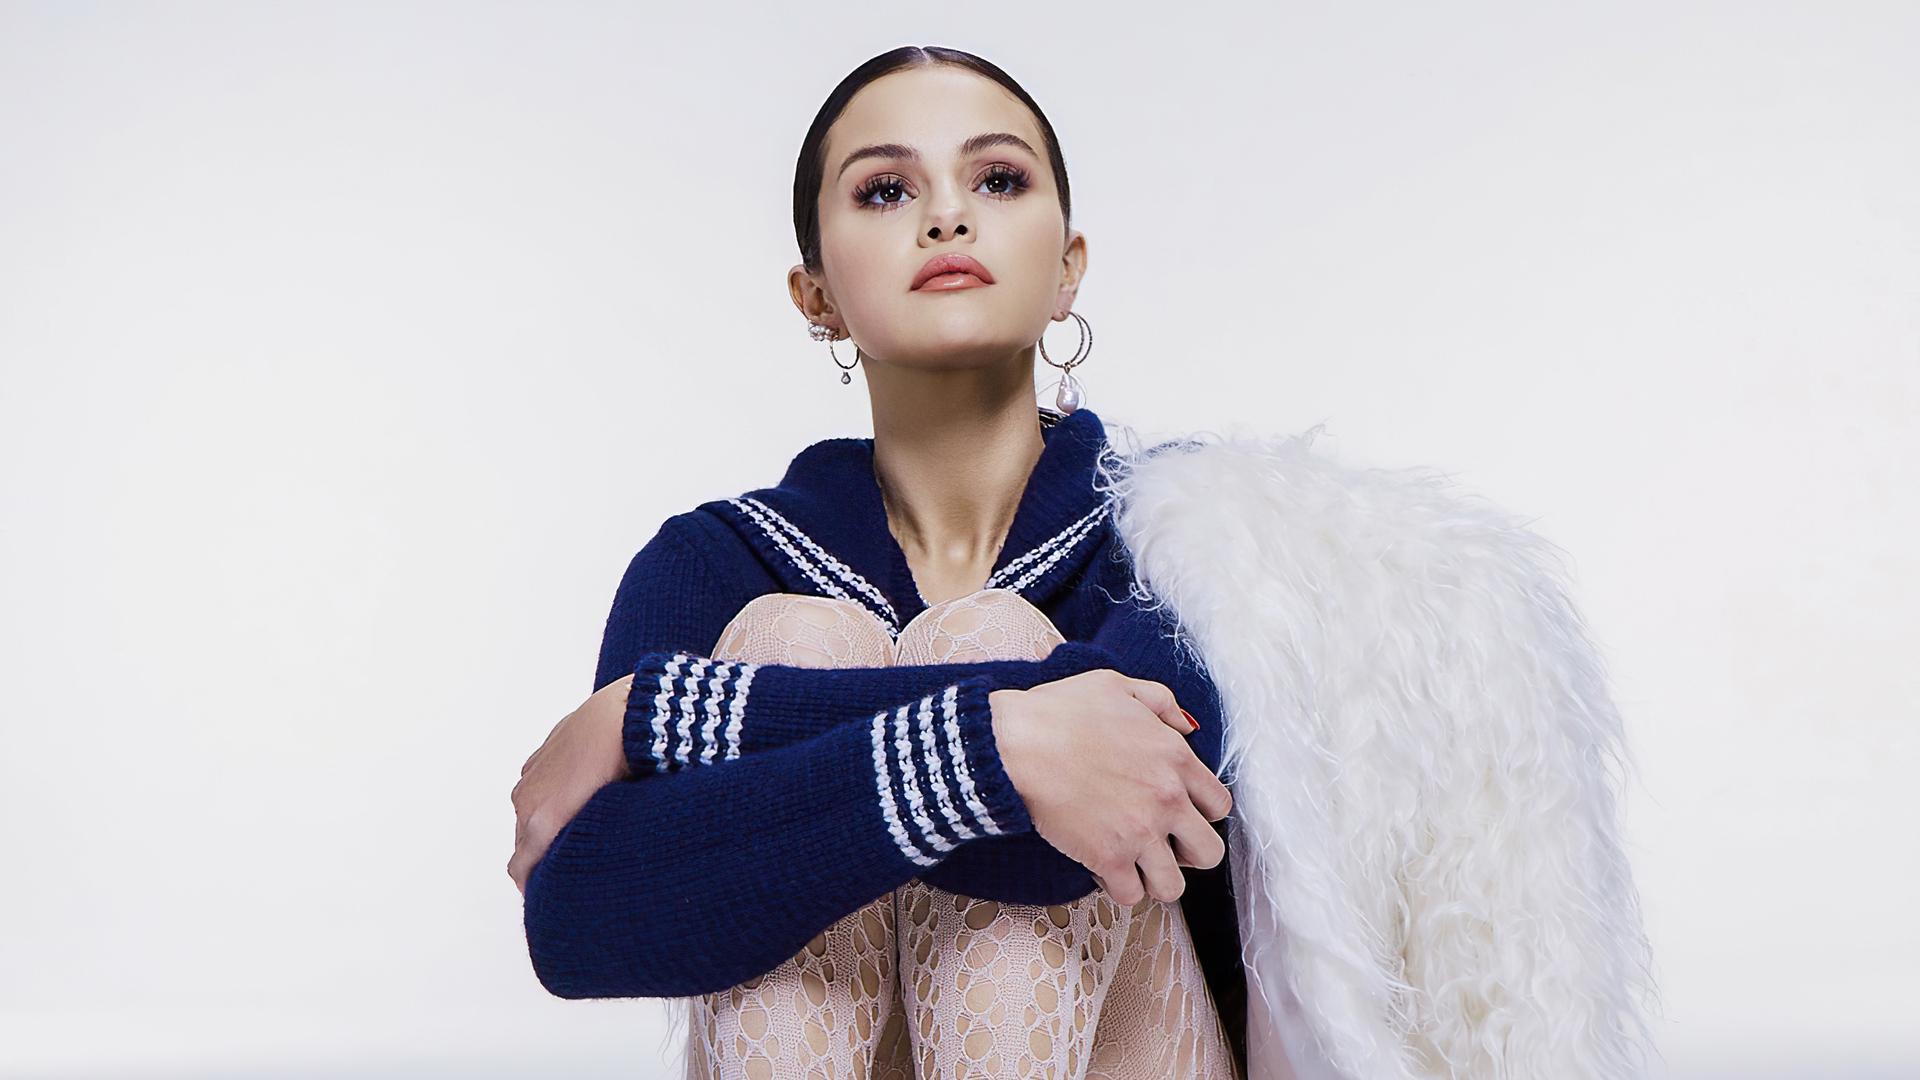 selena-gomez-cr-fashion-book-photoshoot-4k-9y.jpg